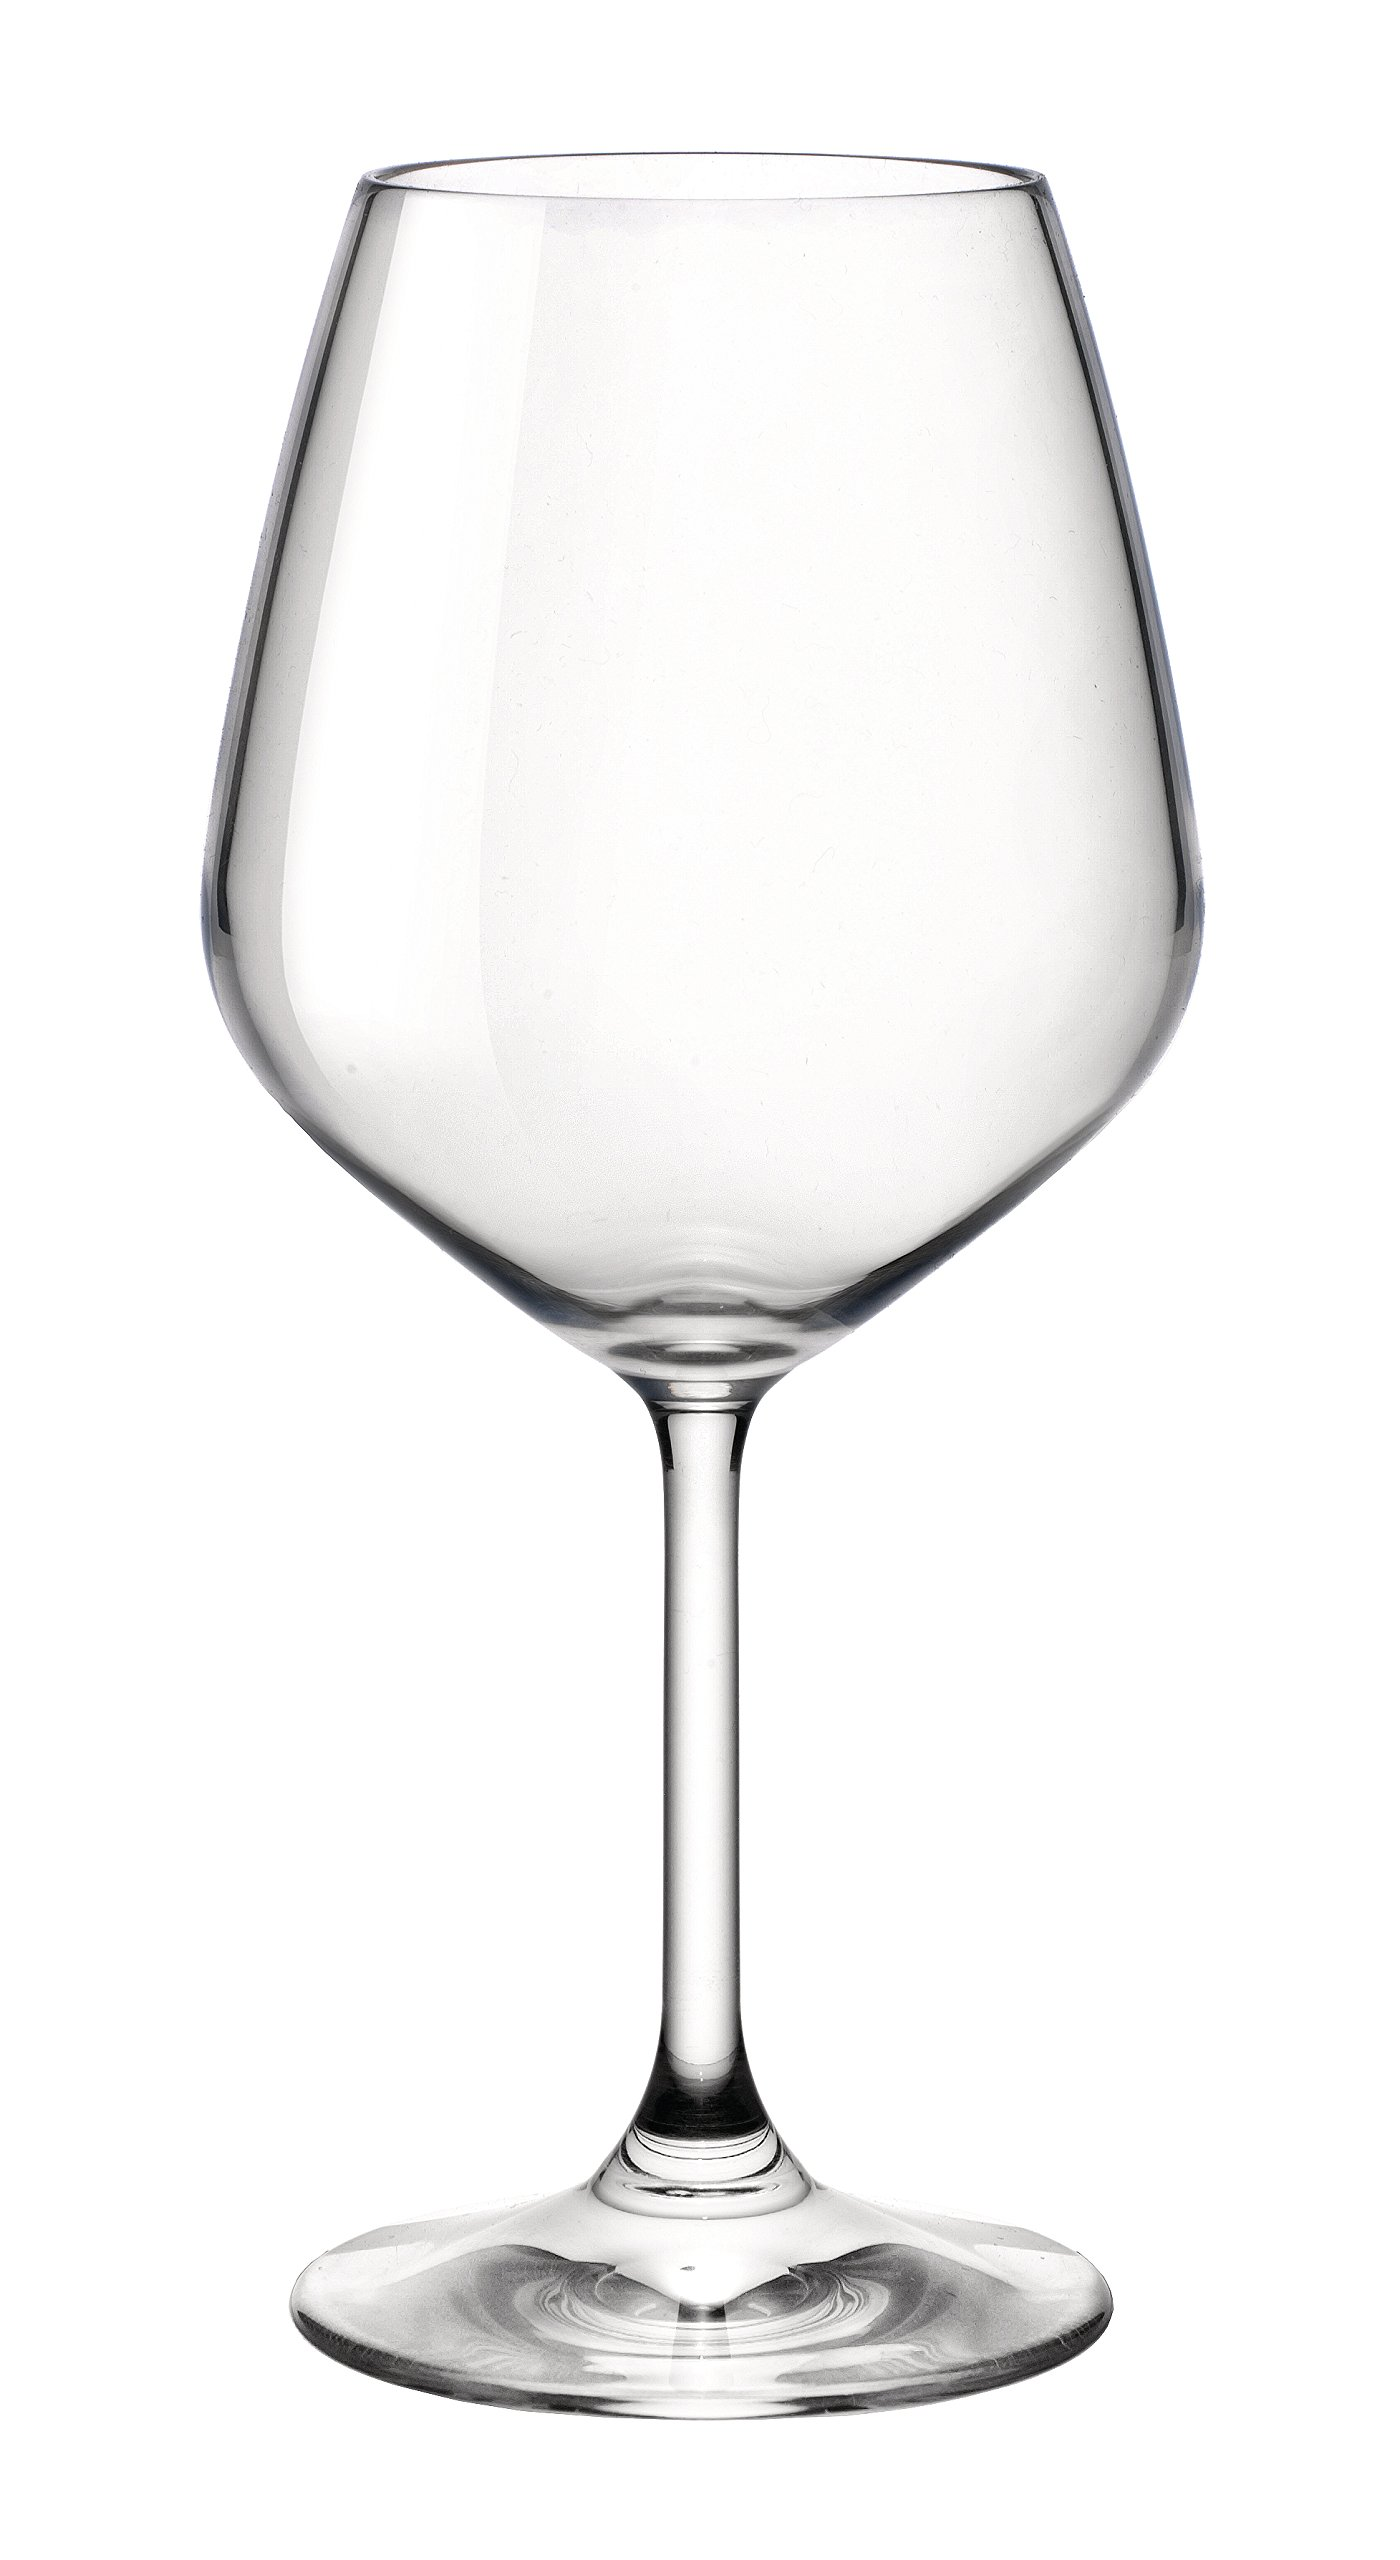 Bormioli Rocco 18oz Red Wine Glasses (Set Of 4): Crystal Clear Star Glass, Laser Cut Rim For Wine Tasting, Lead-Free Cups, Elegant Party Drinking Glassware, Dishwasher Safe, Restaurant Quality by Bormioli Rocco